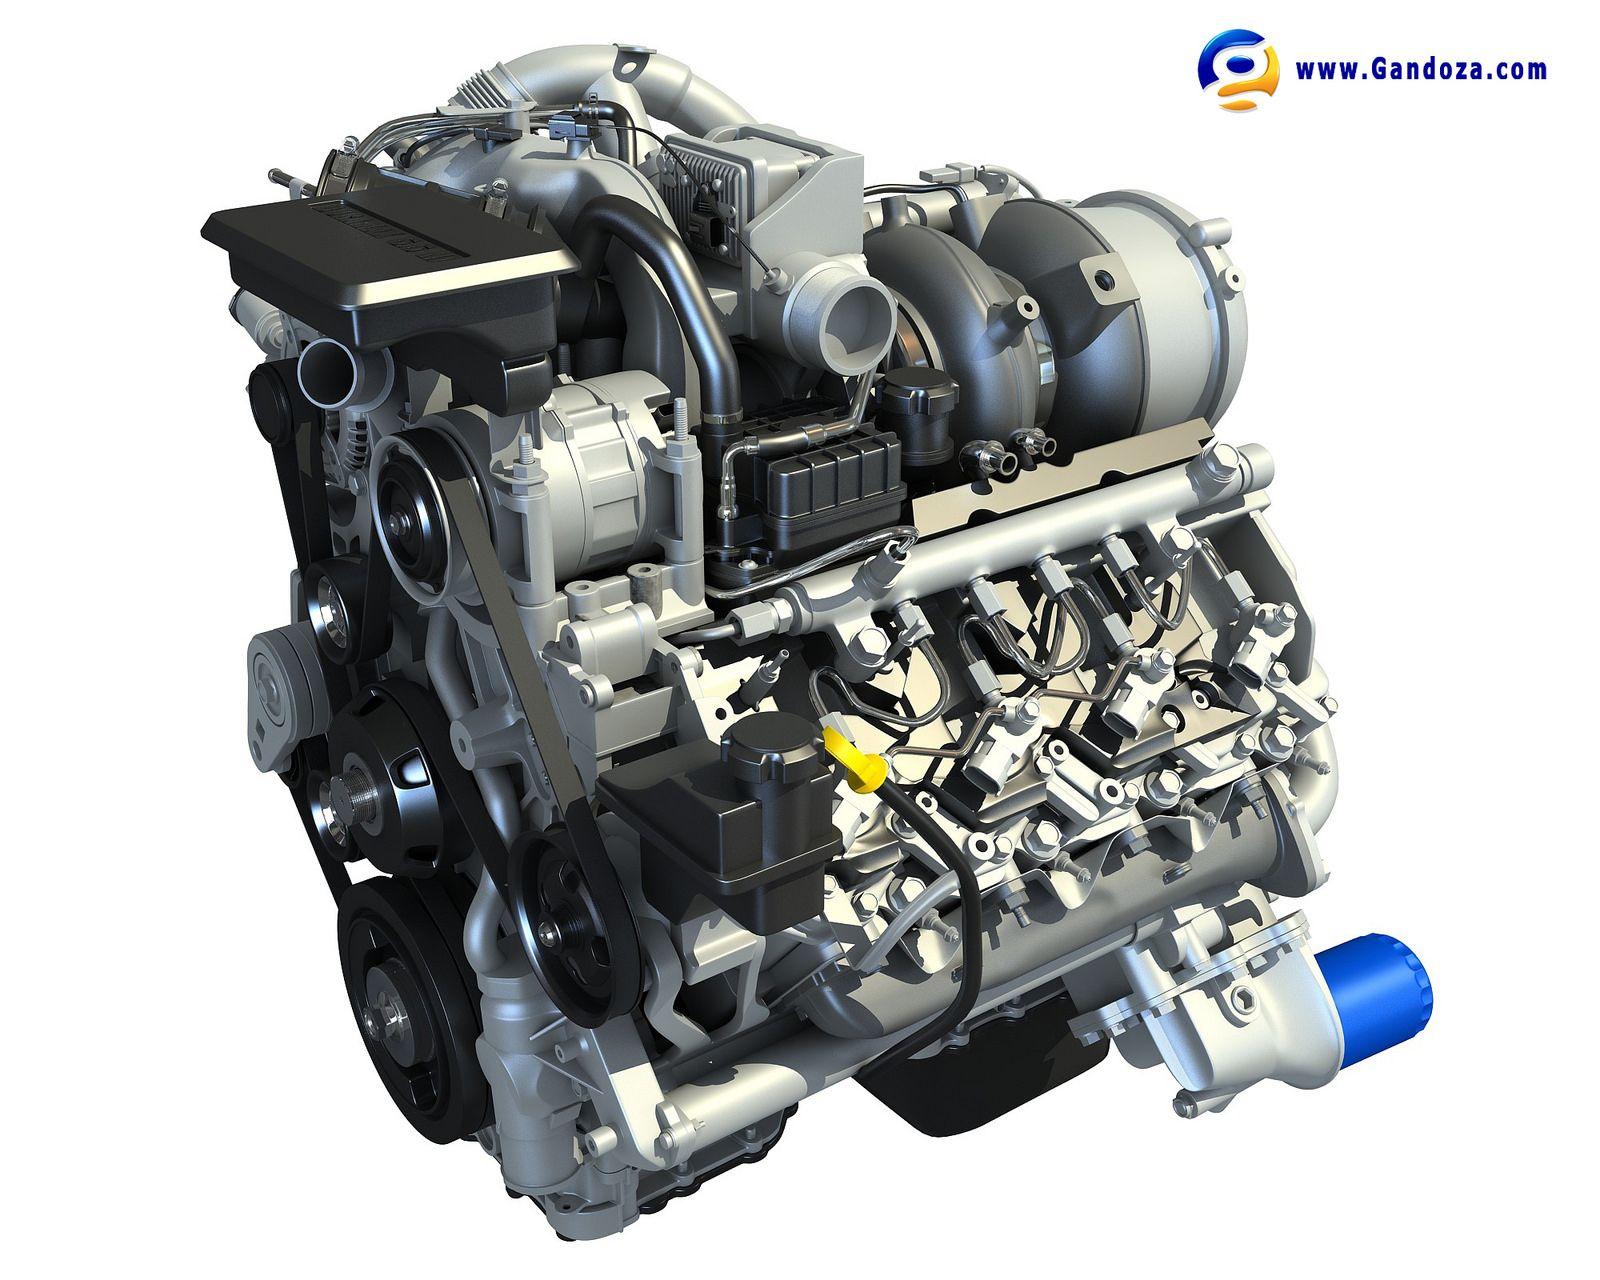 Duramax V8 Turbo Engine Model Duramax Diesel Trucks Duramax